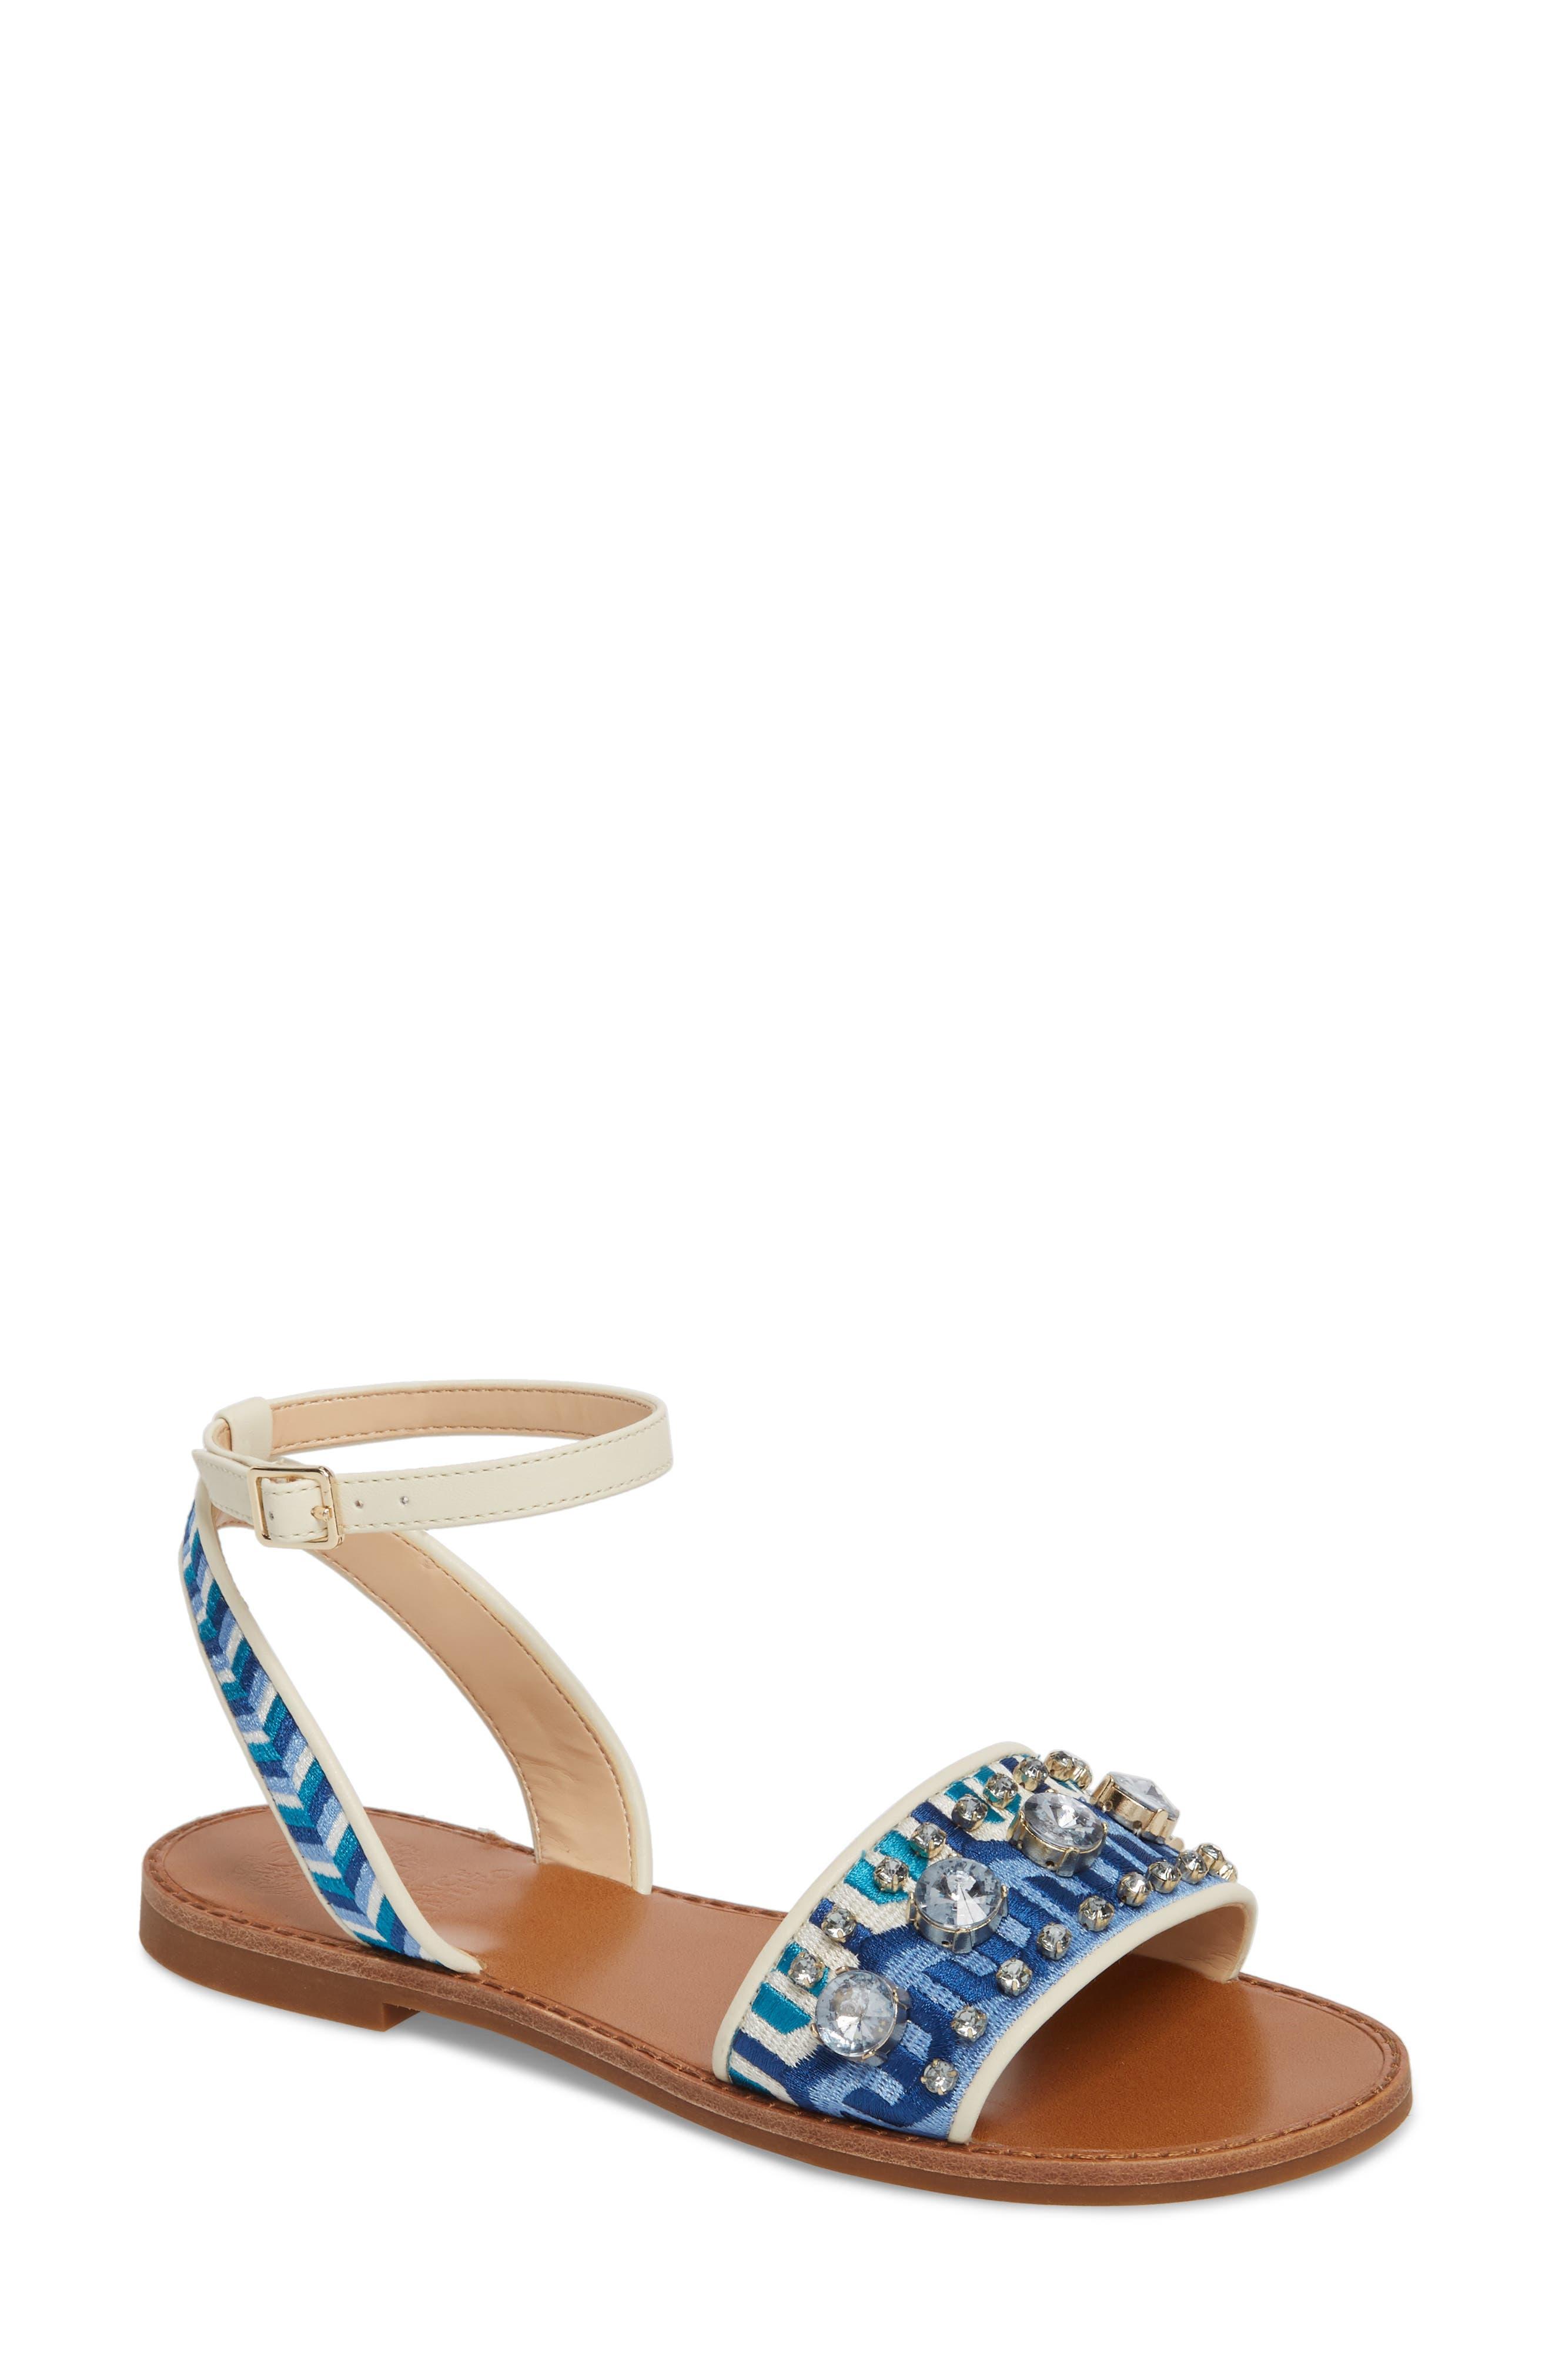 Akitta Sandal,                         Main,                         color, Blue Multi/ Vanilla Fabric